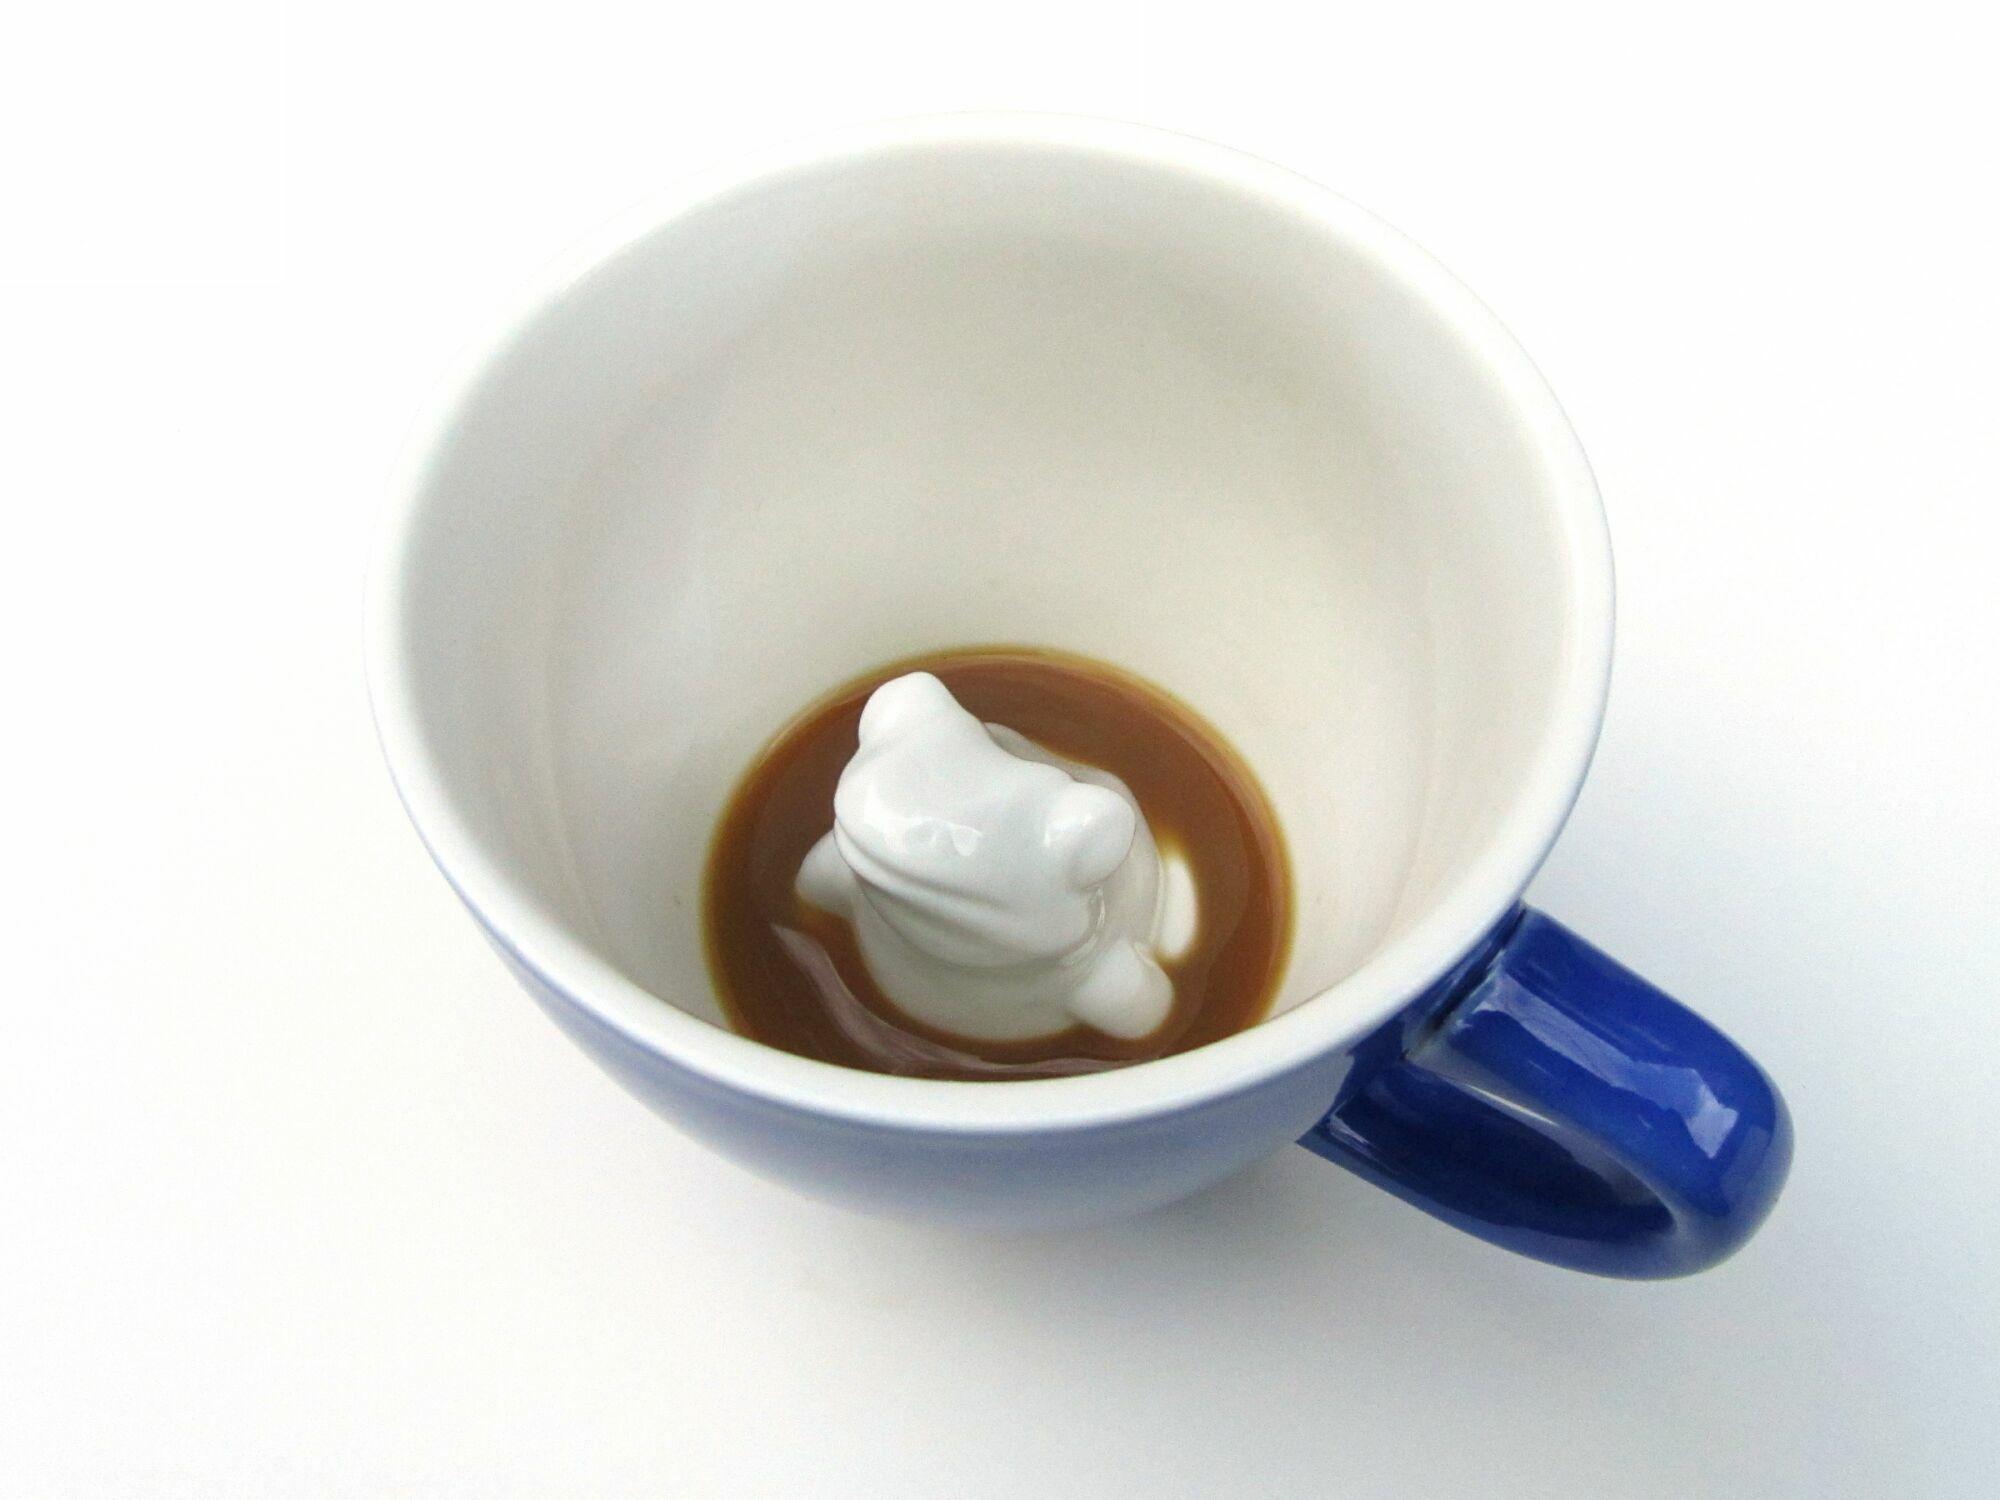 Пинкл (Pinkl) | Кружка с лягушкой 330мл | Creature Cups FrogCup 11oz